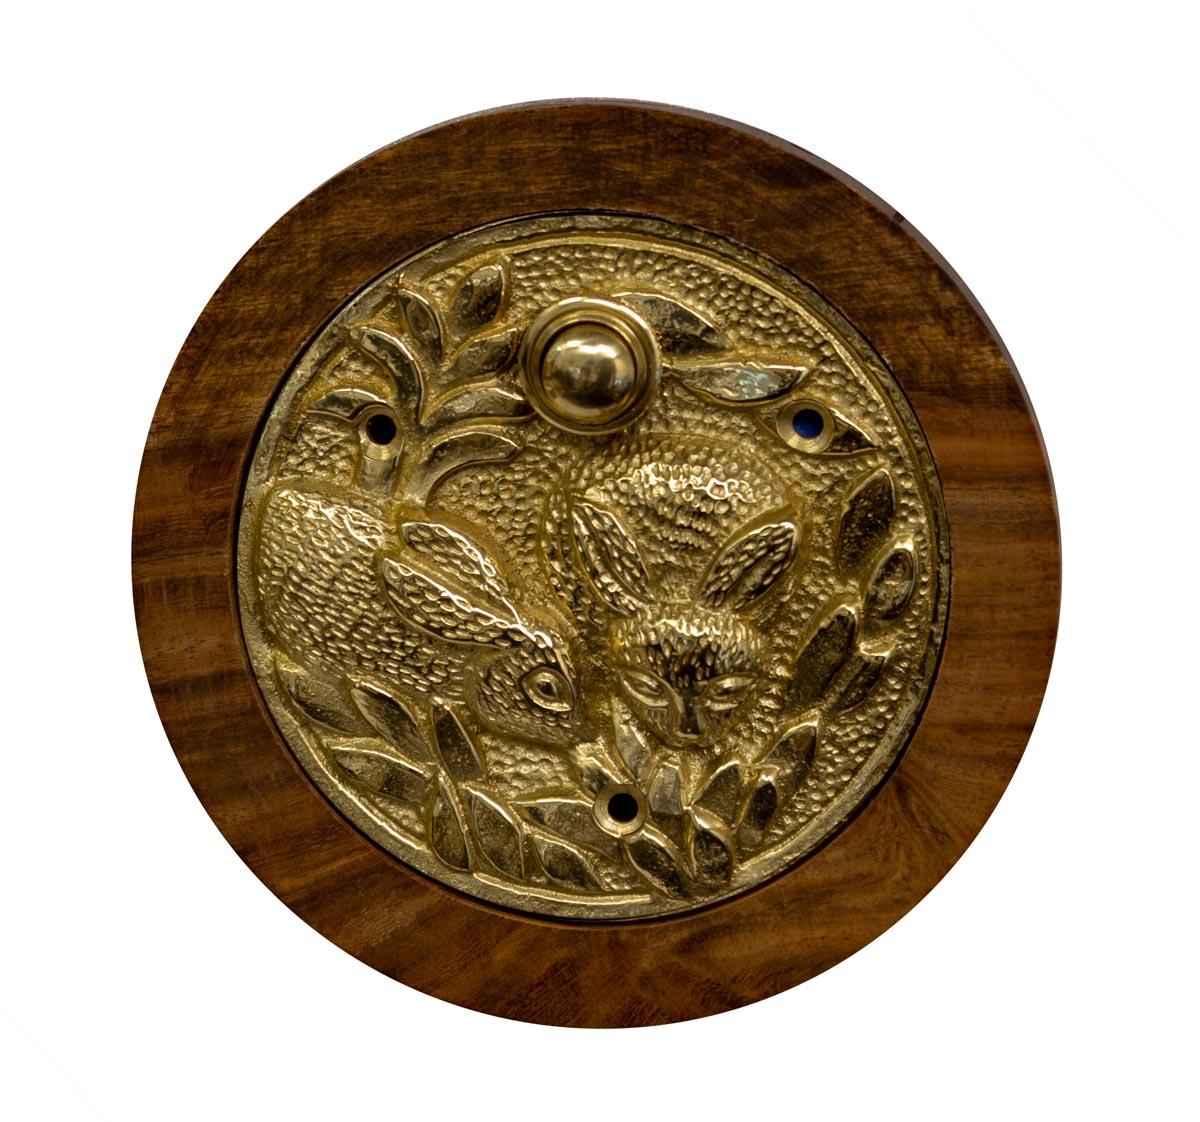 Large Round Decorative Doorbell